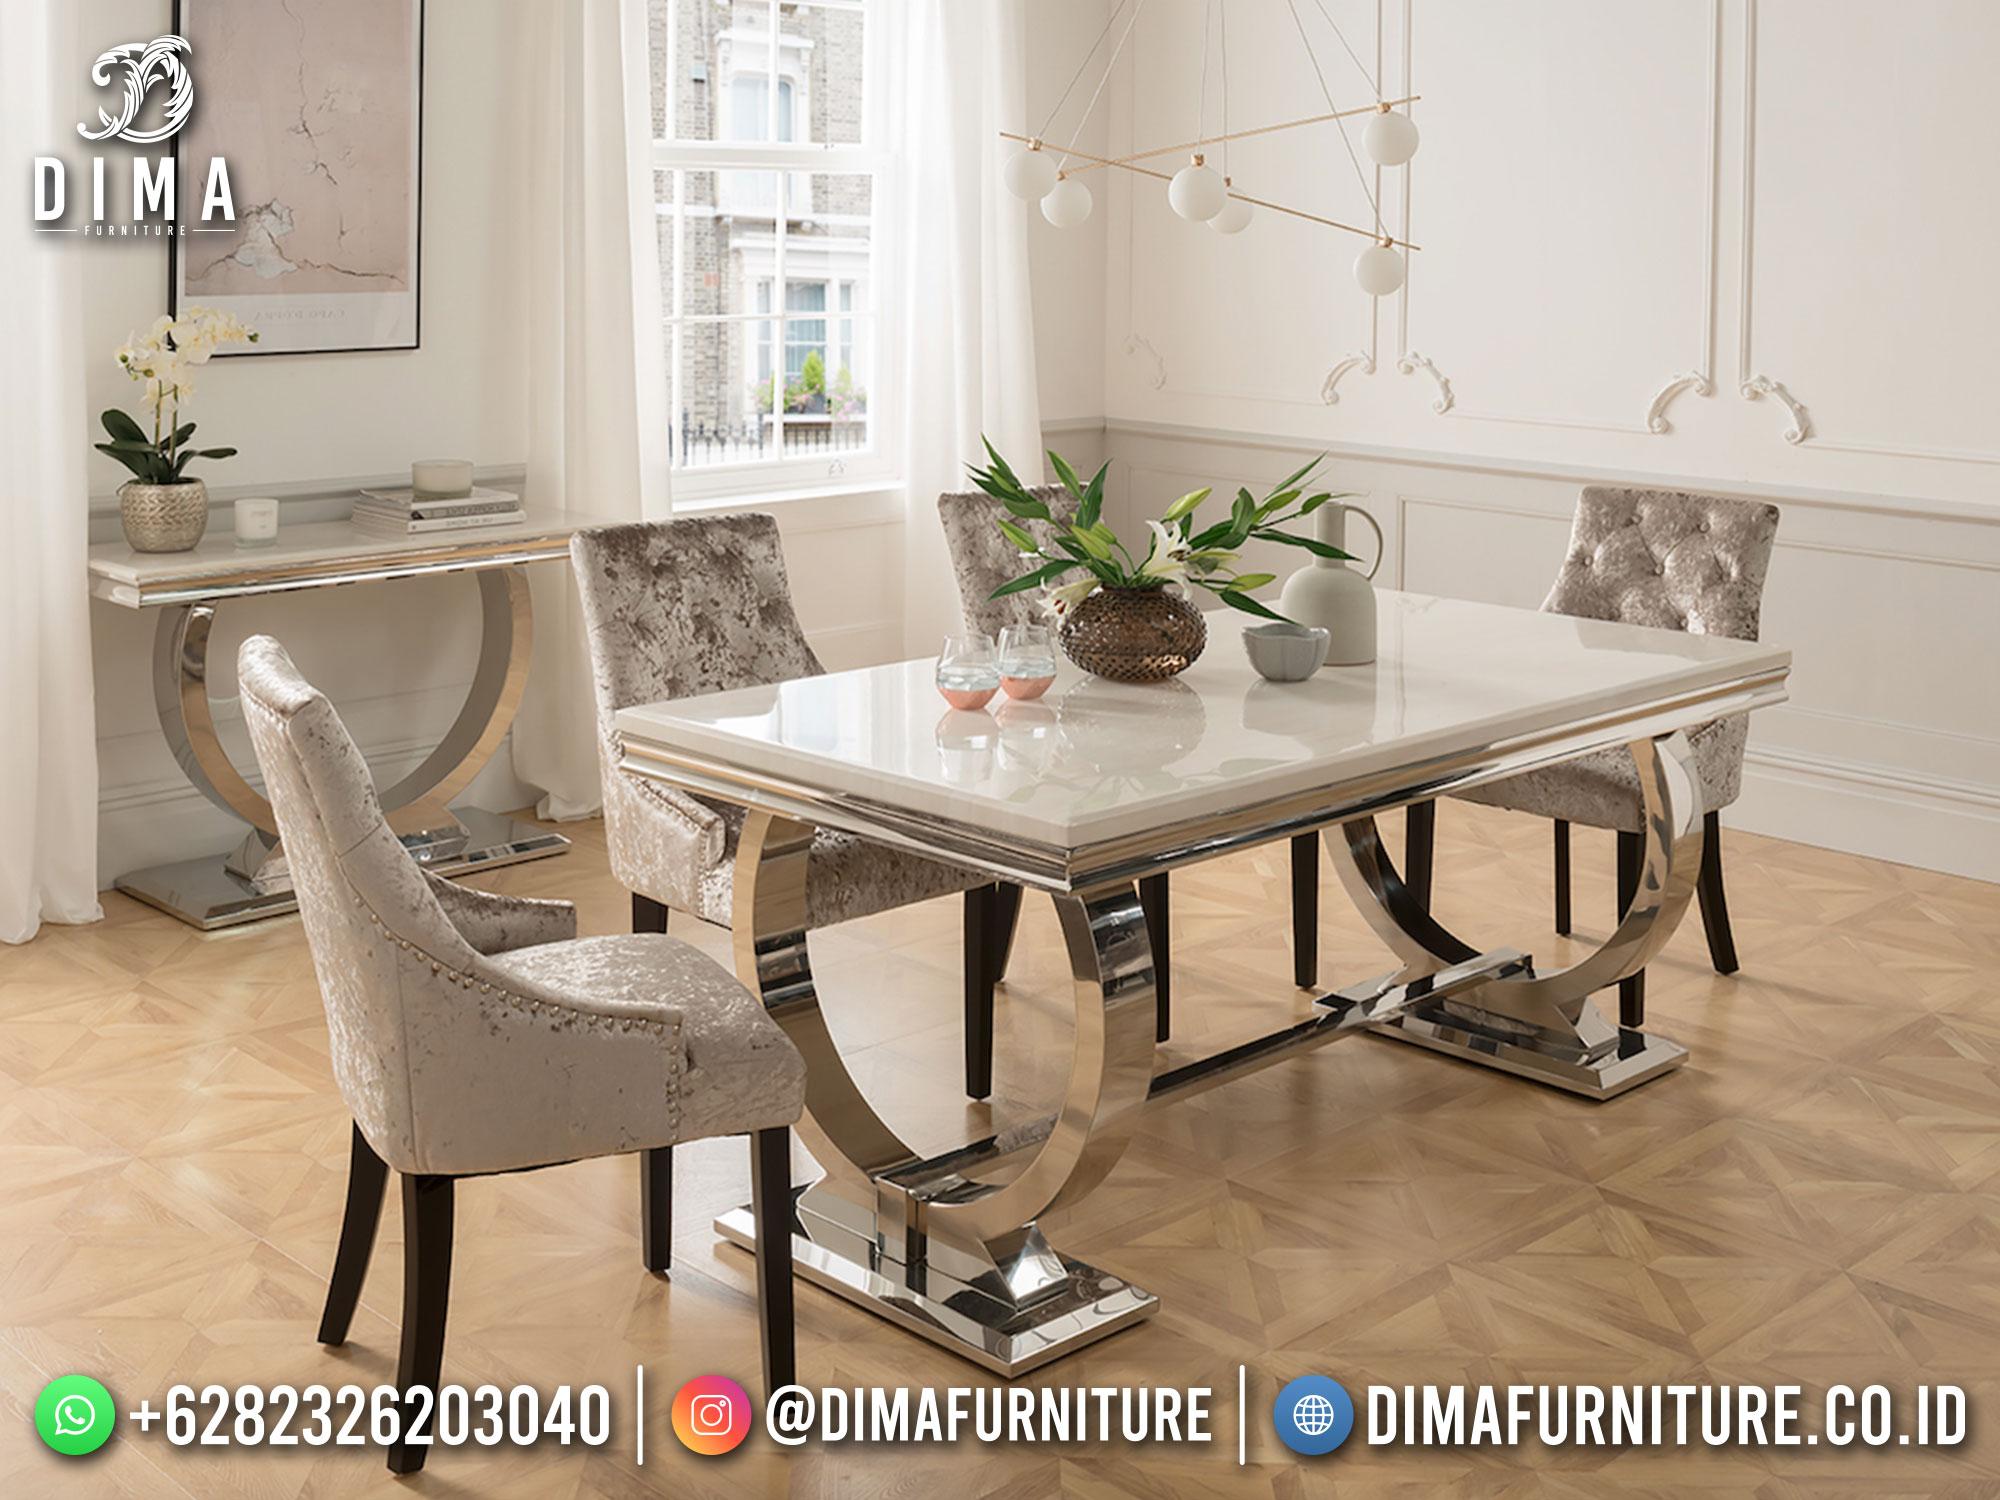 Meja Makan Minimalis Modern Stainless Steel Luxury Elegant Design TTJ-1745